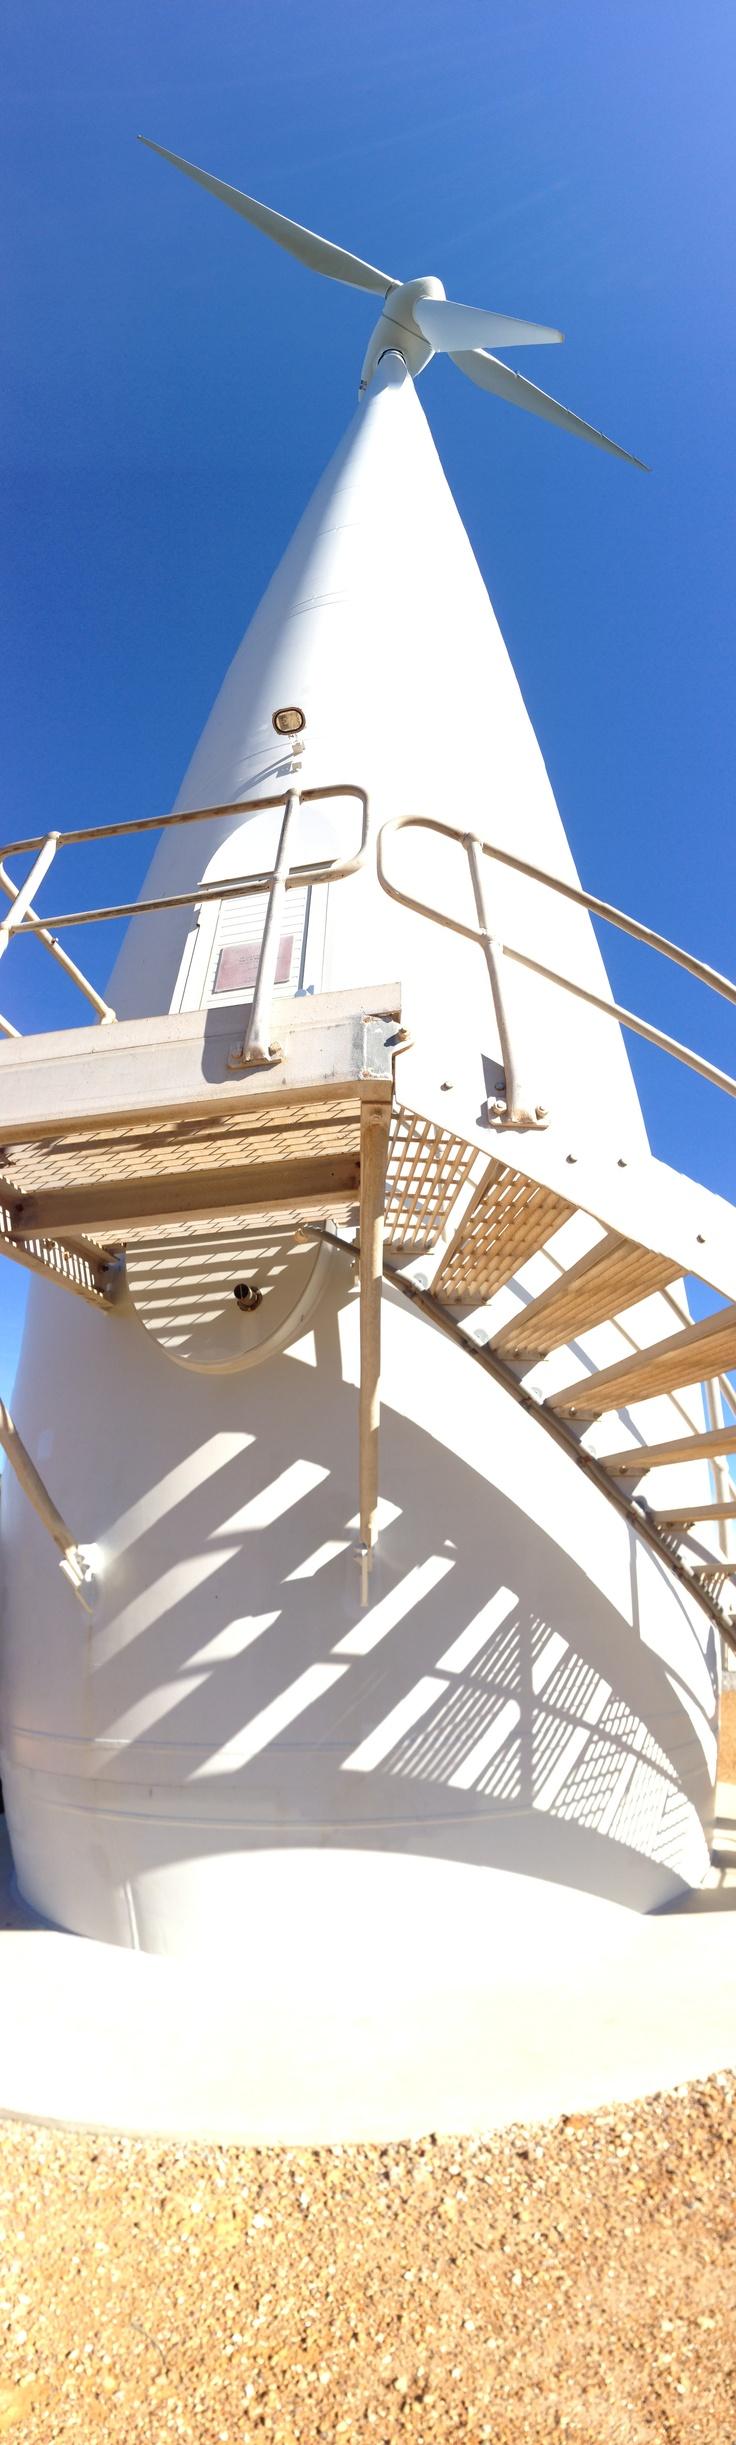 Albany Wind Farm Wind Turbine Torndirrup National Park Albany, Western Australia.